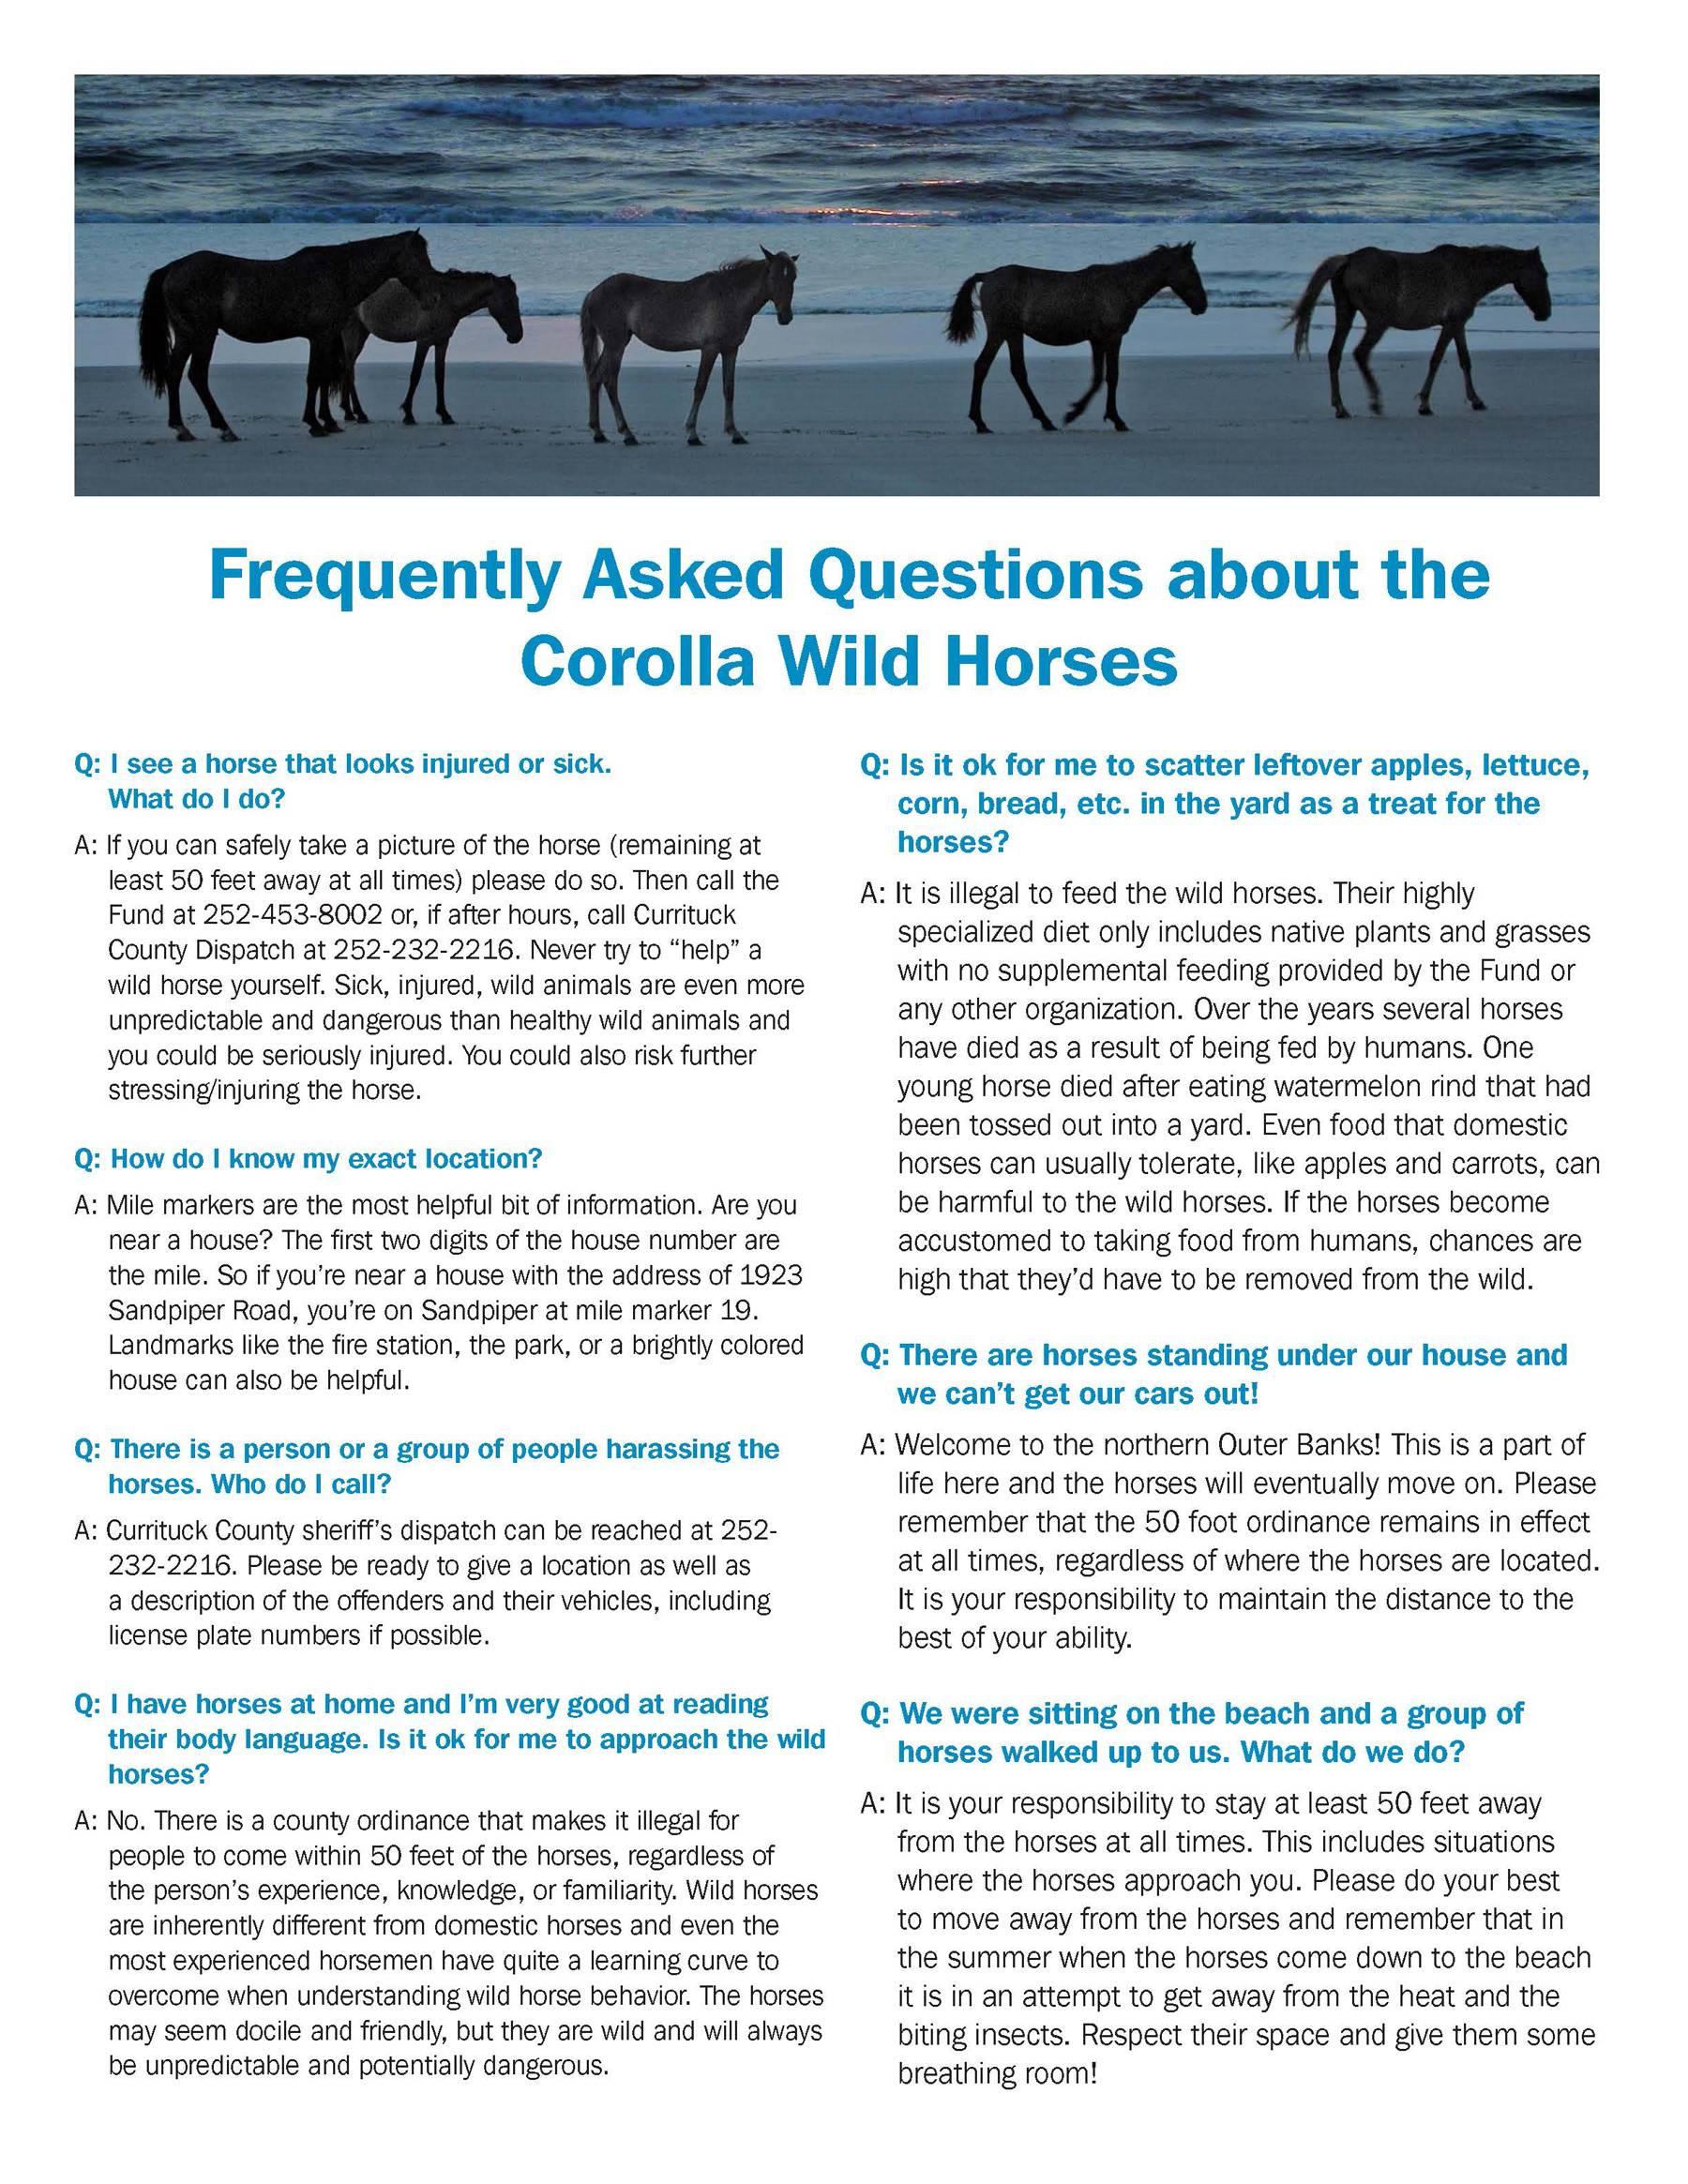 Corolla Wild Horese FAQ